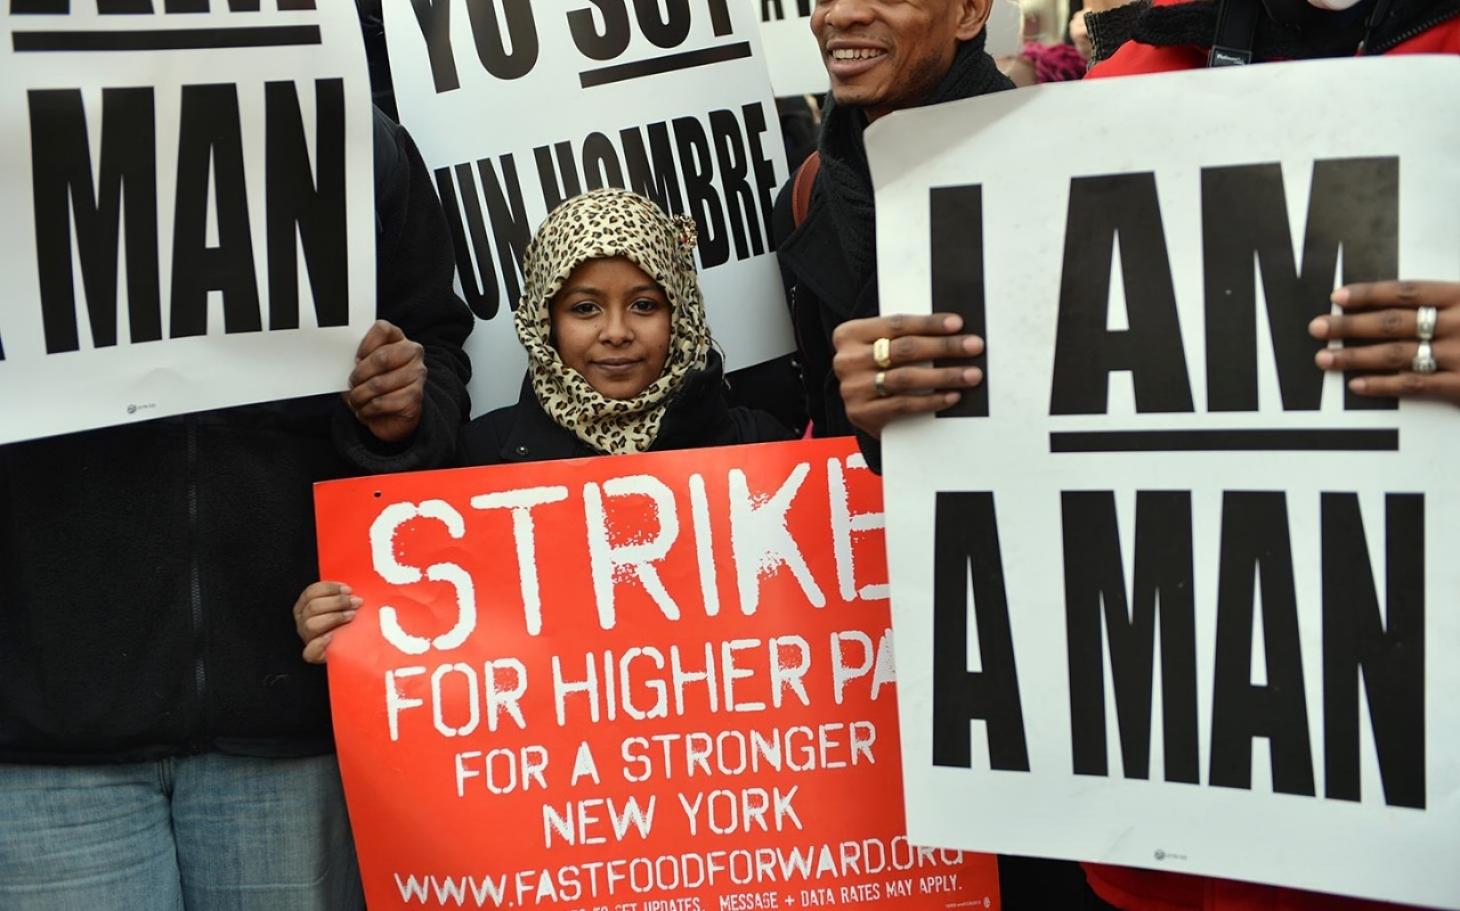 workers wages fell as bosses profits boomed al jazeera america